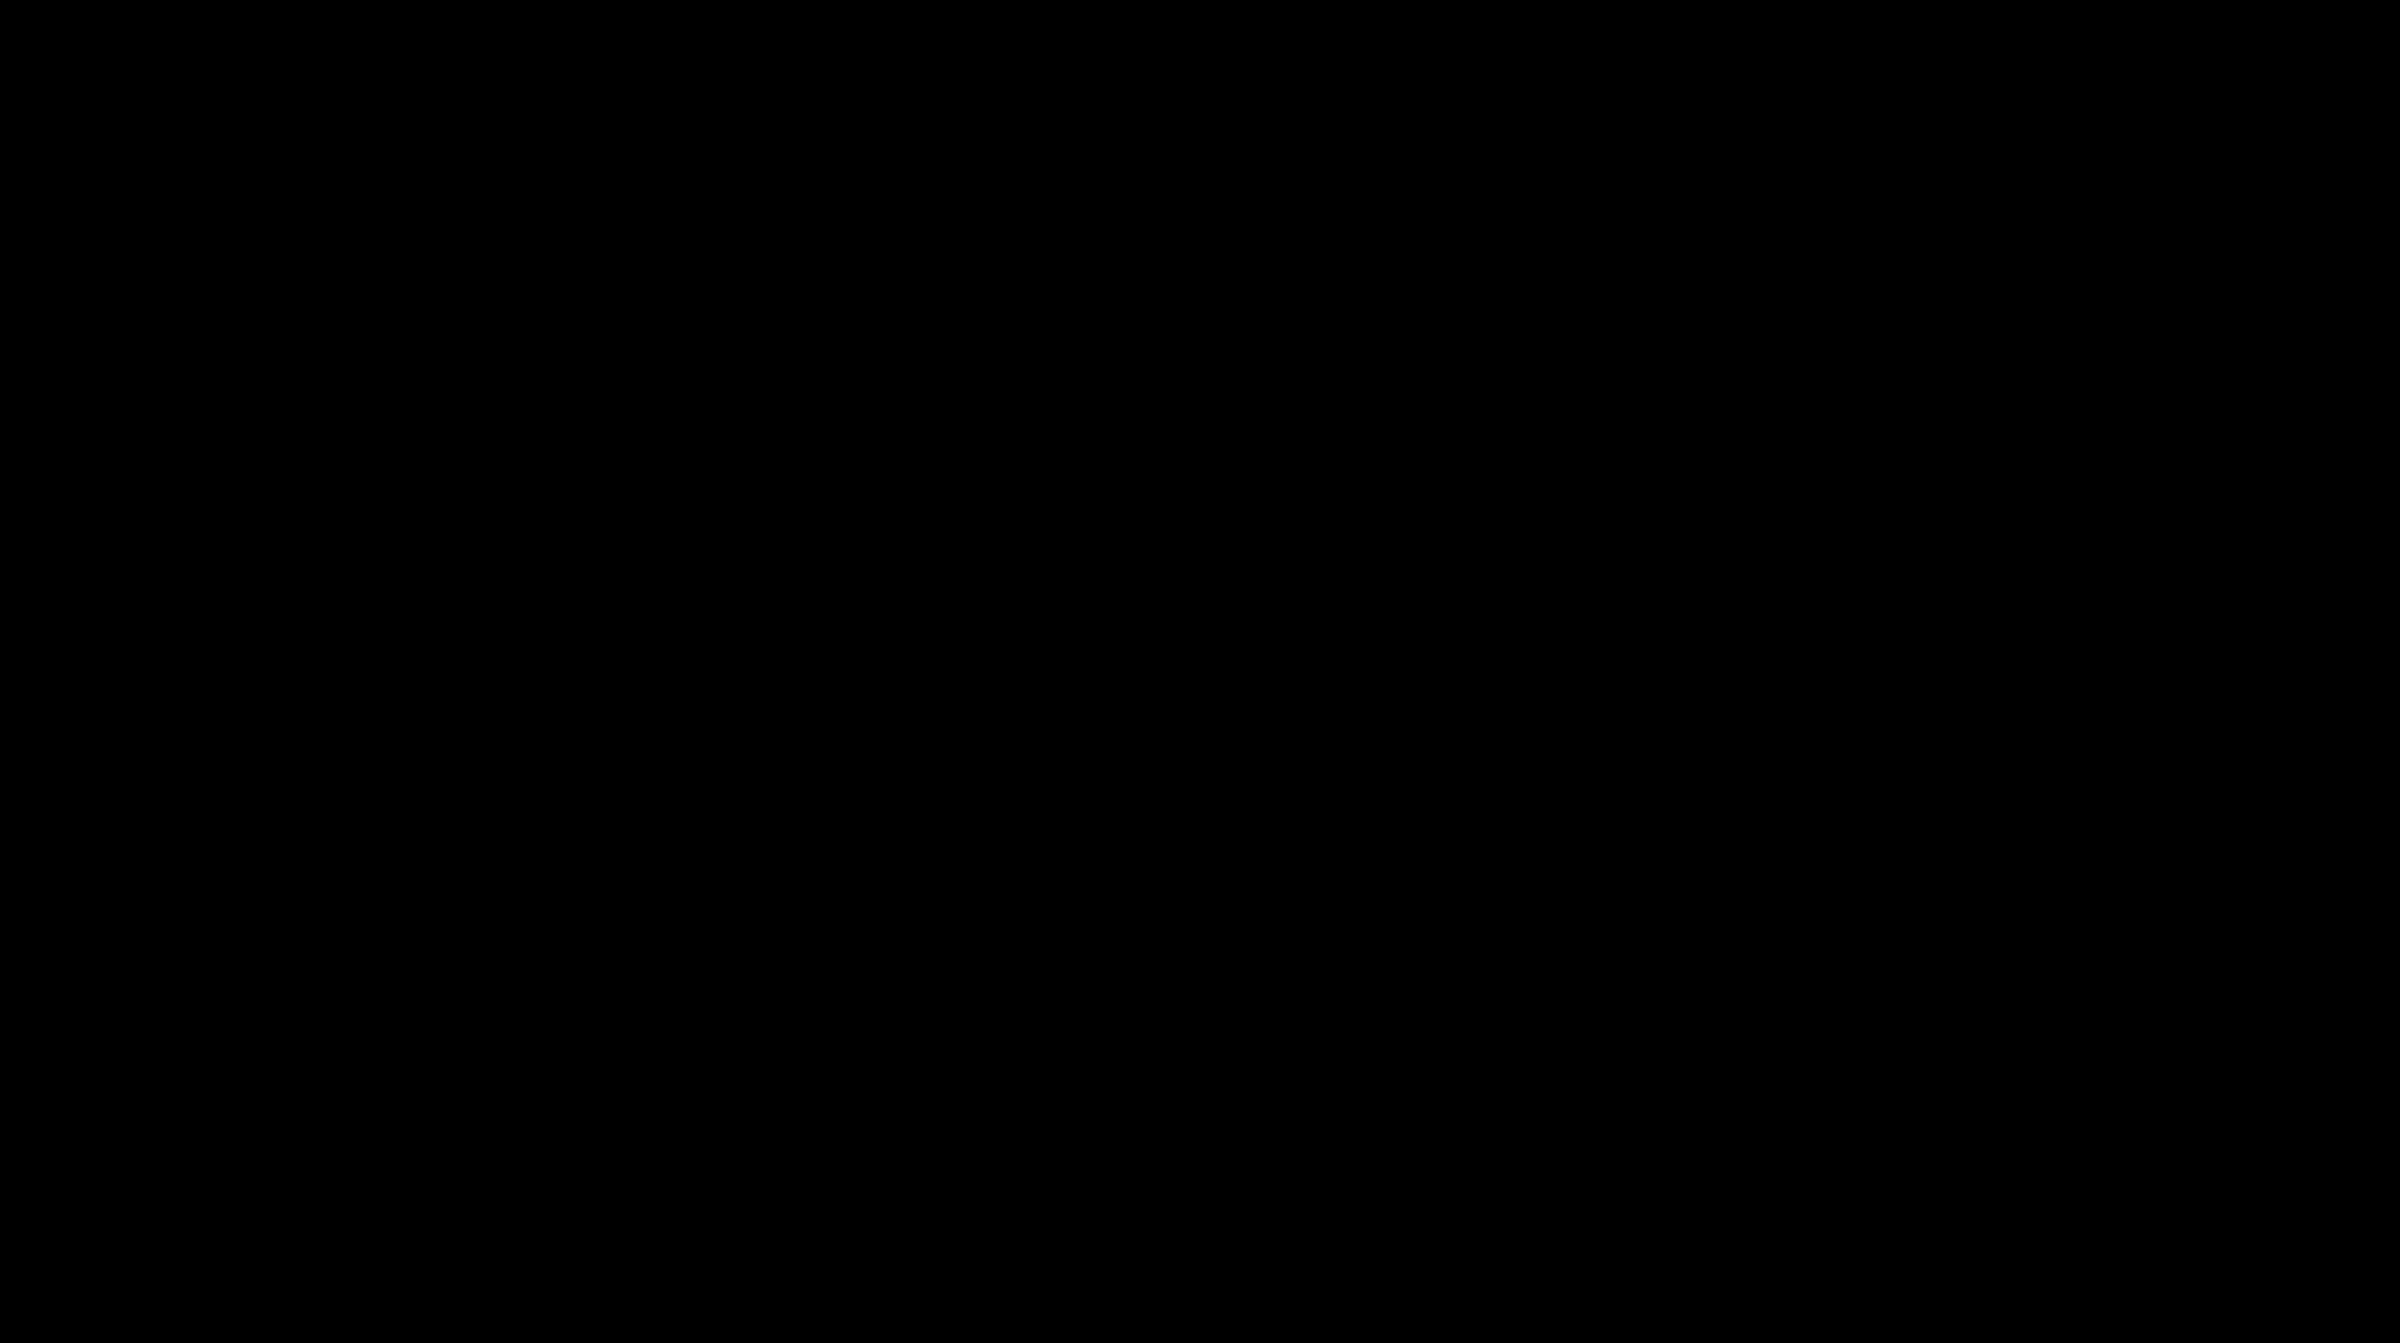 2400x1343 Shotgun Clipart Transparent Background